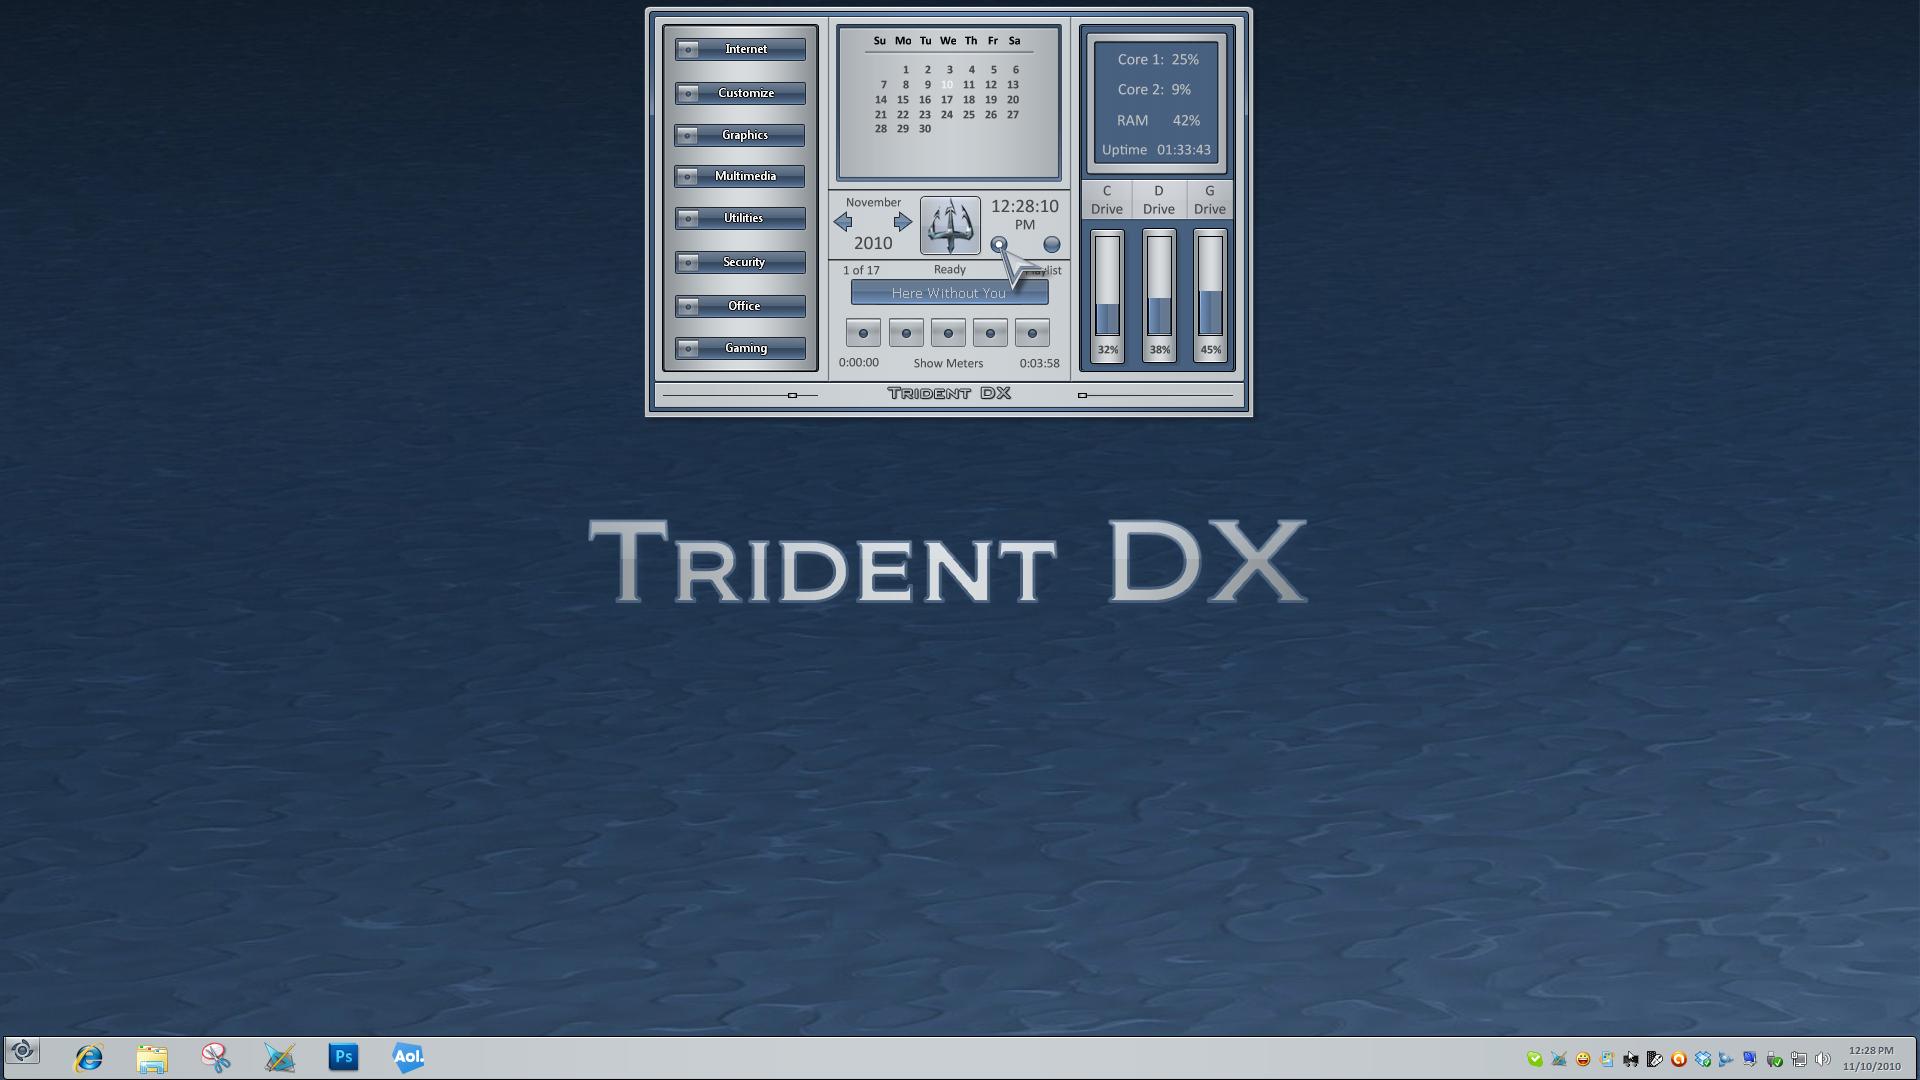 Trident DX